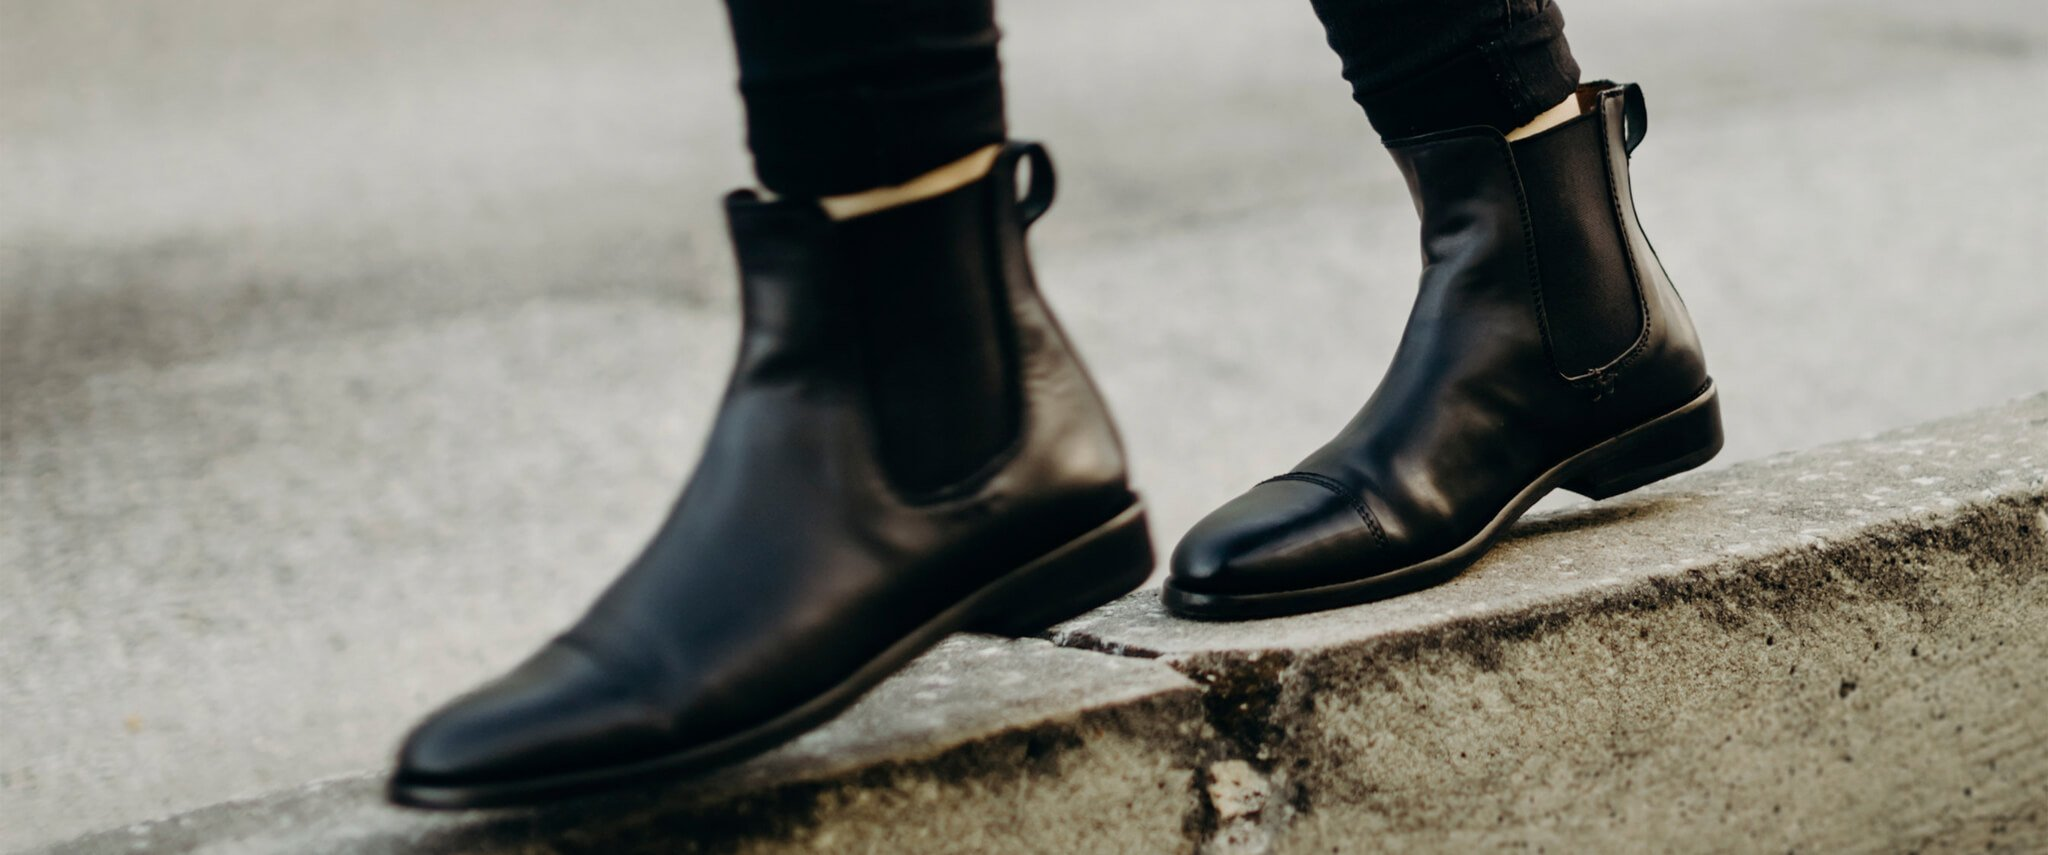 scarpe indispensabili inverno